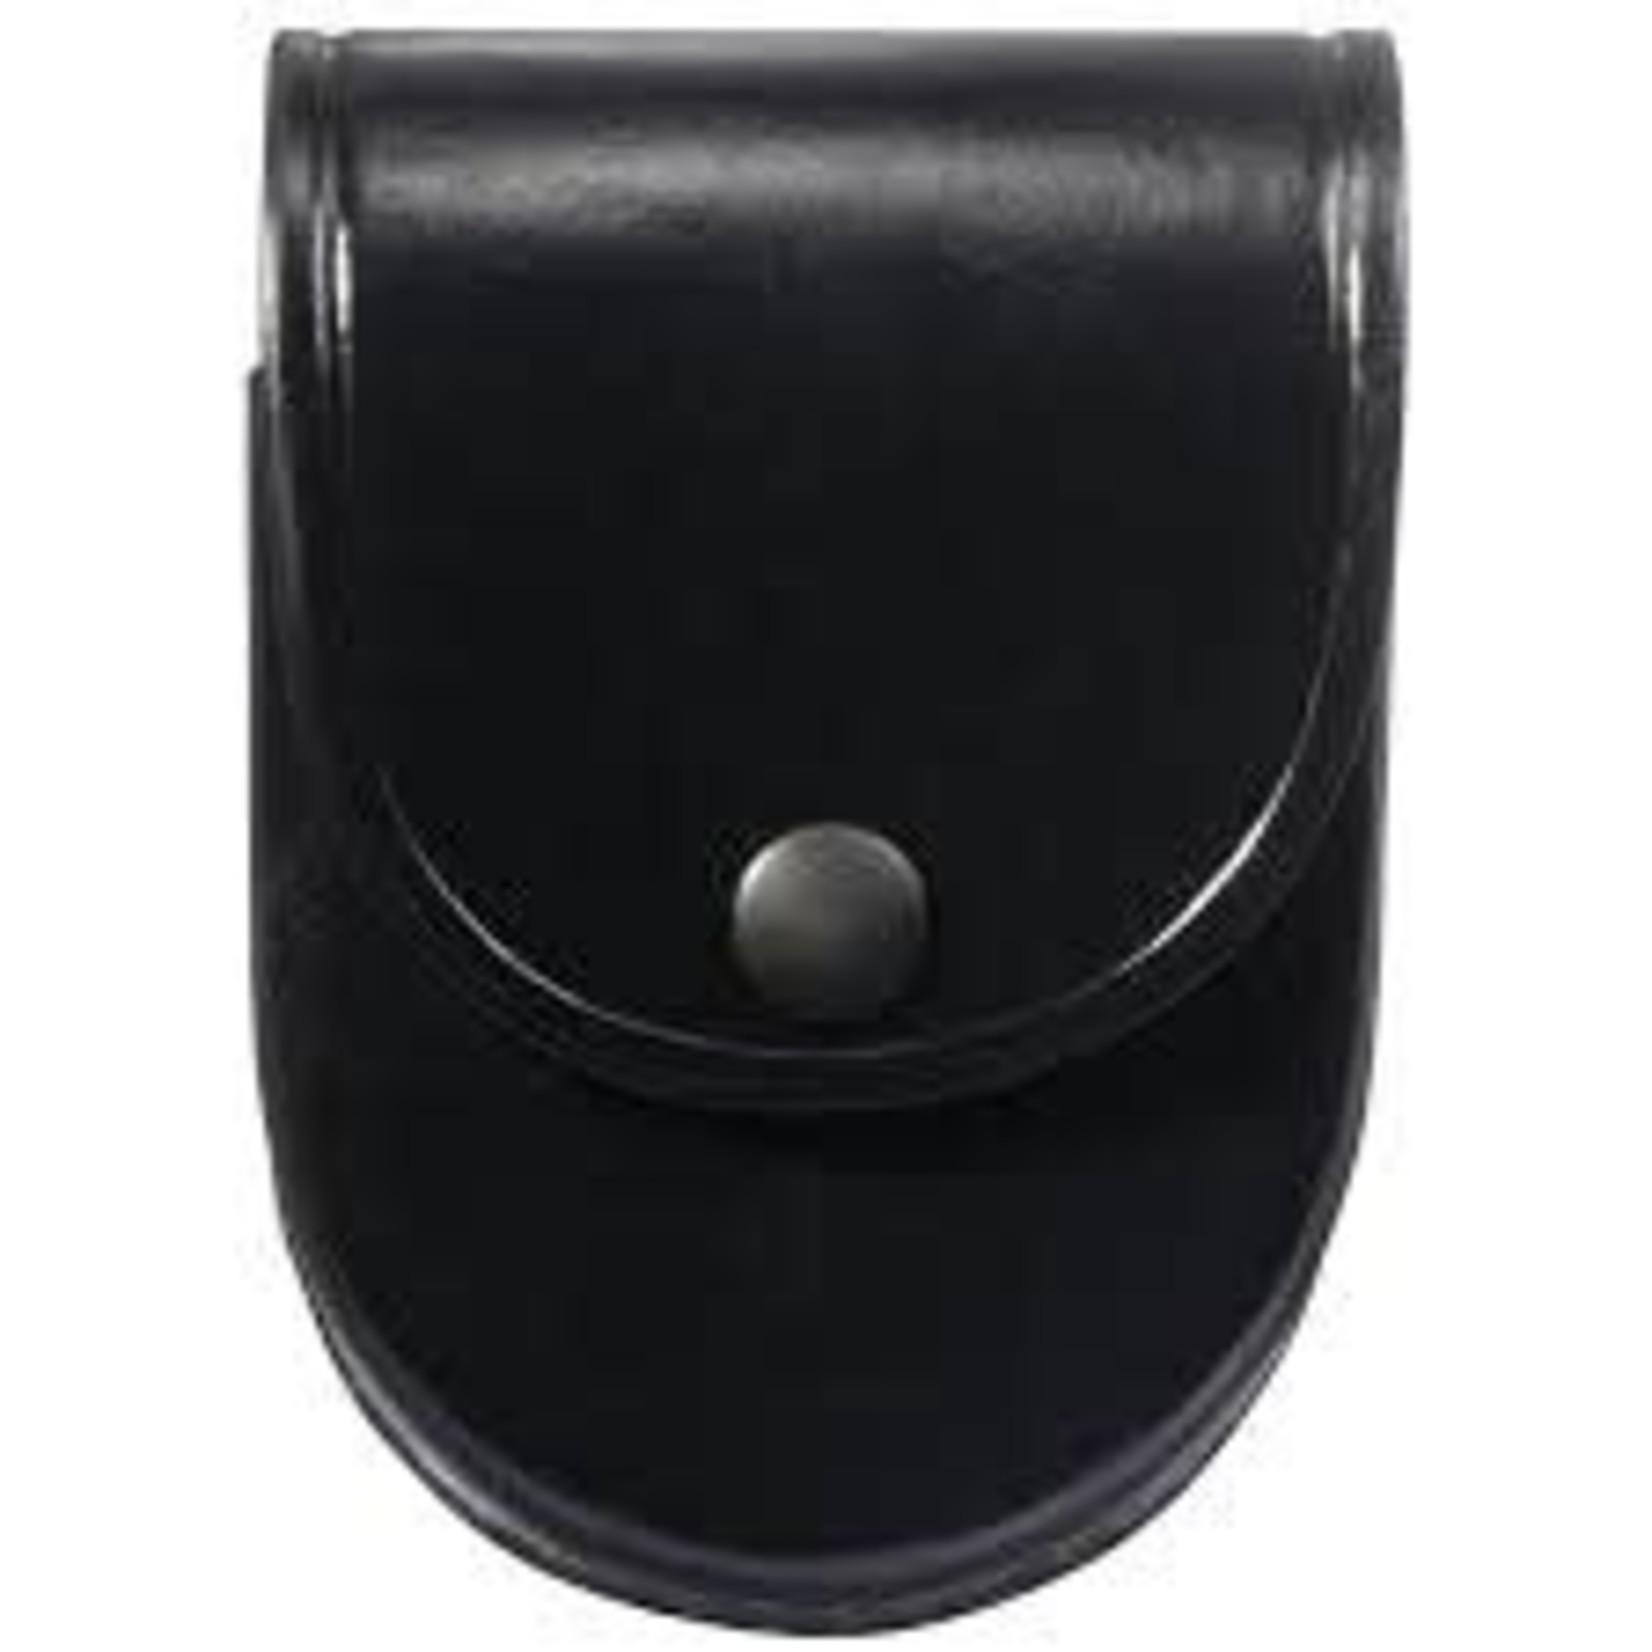 ASP ASP Centurion Handcuff Case